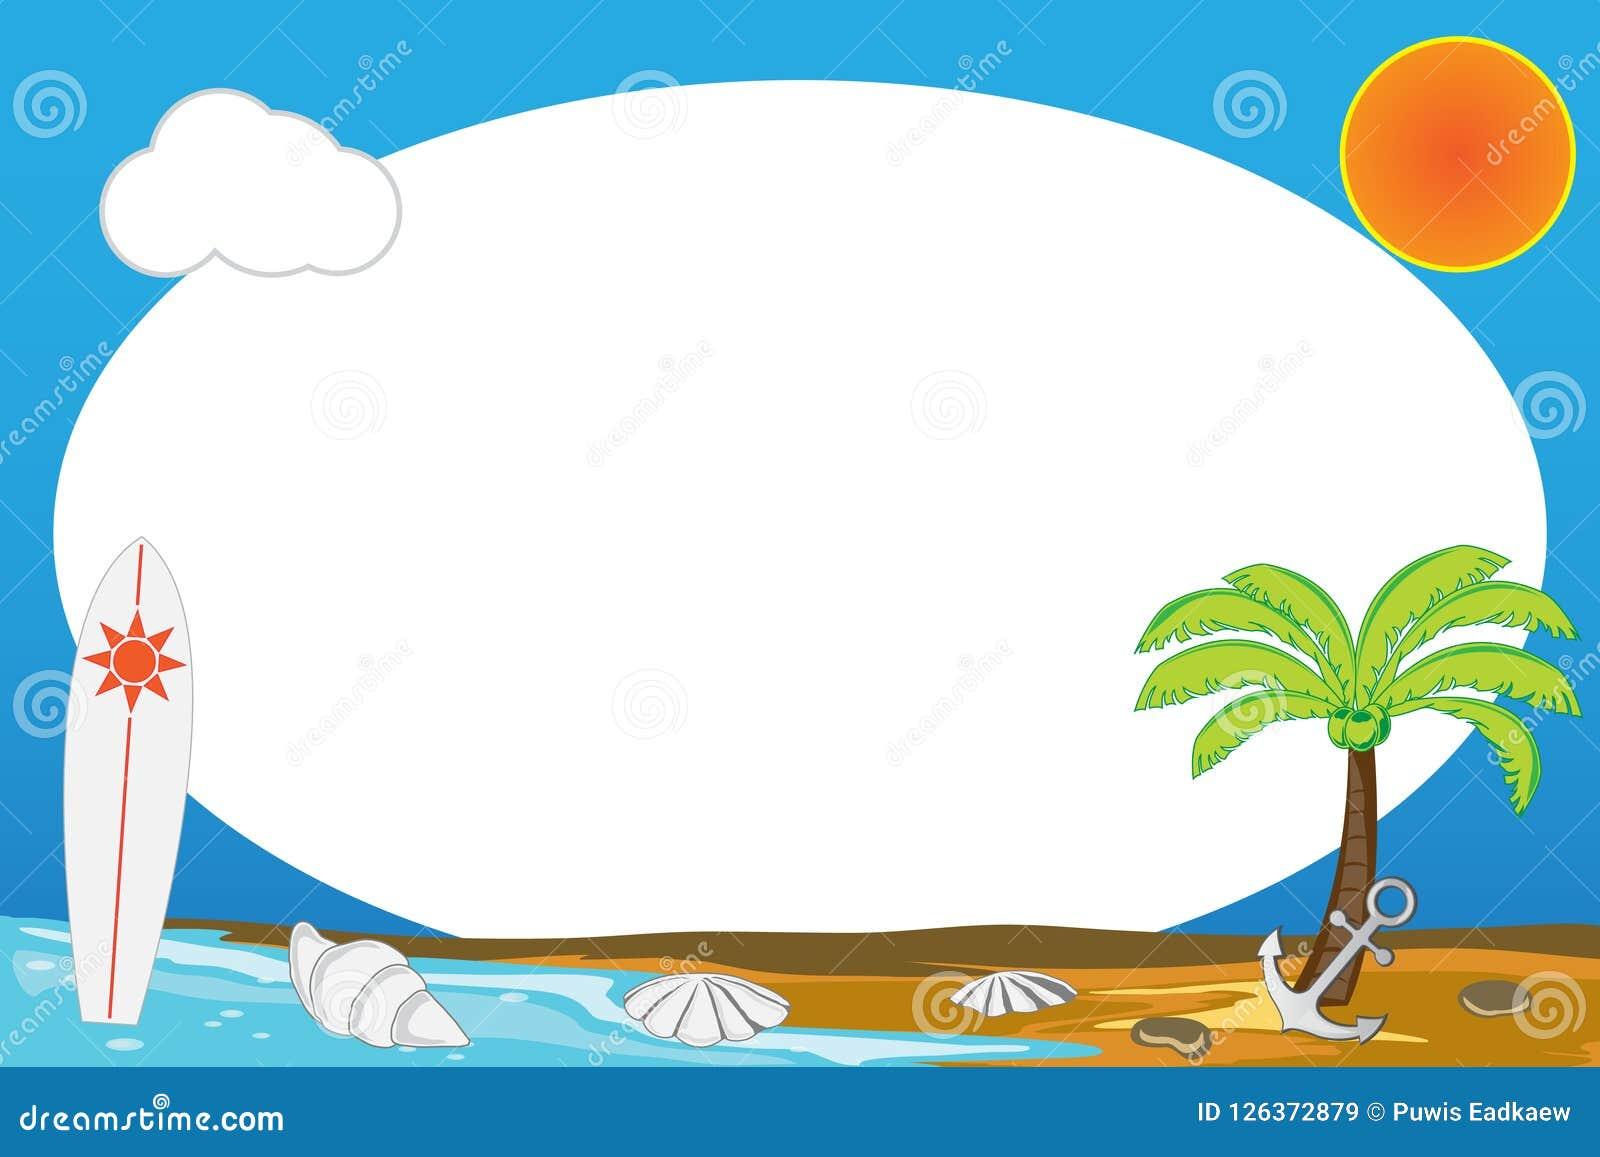 Beach Frames In Summer Season Stock Illustration - Illustration of ...